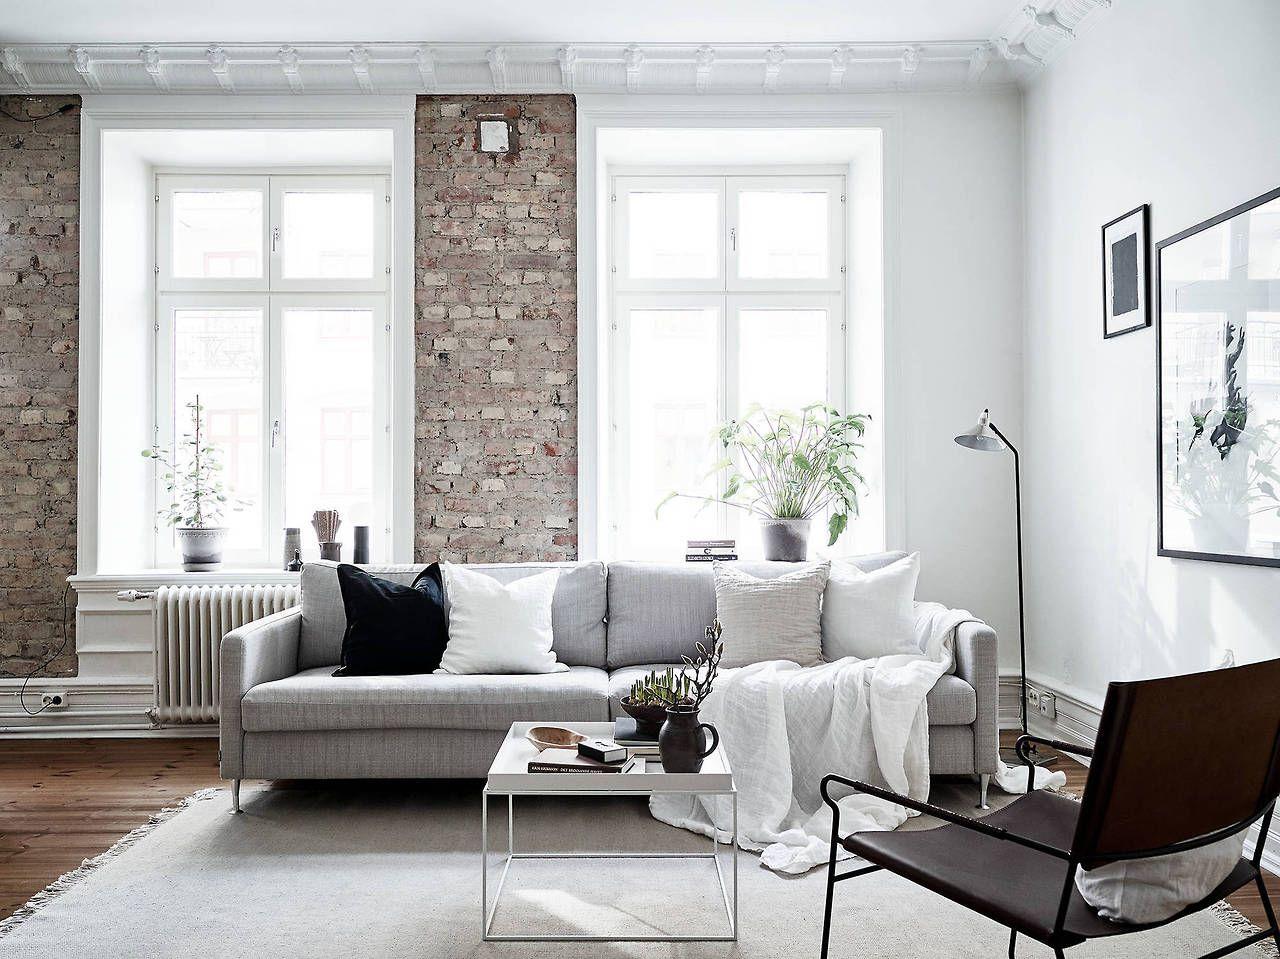 Elegant Photo Of Apartment Decorating White Fresh Ways To Decorate Your